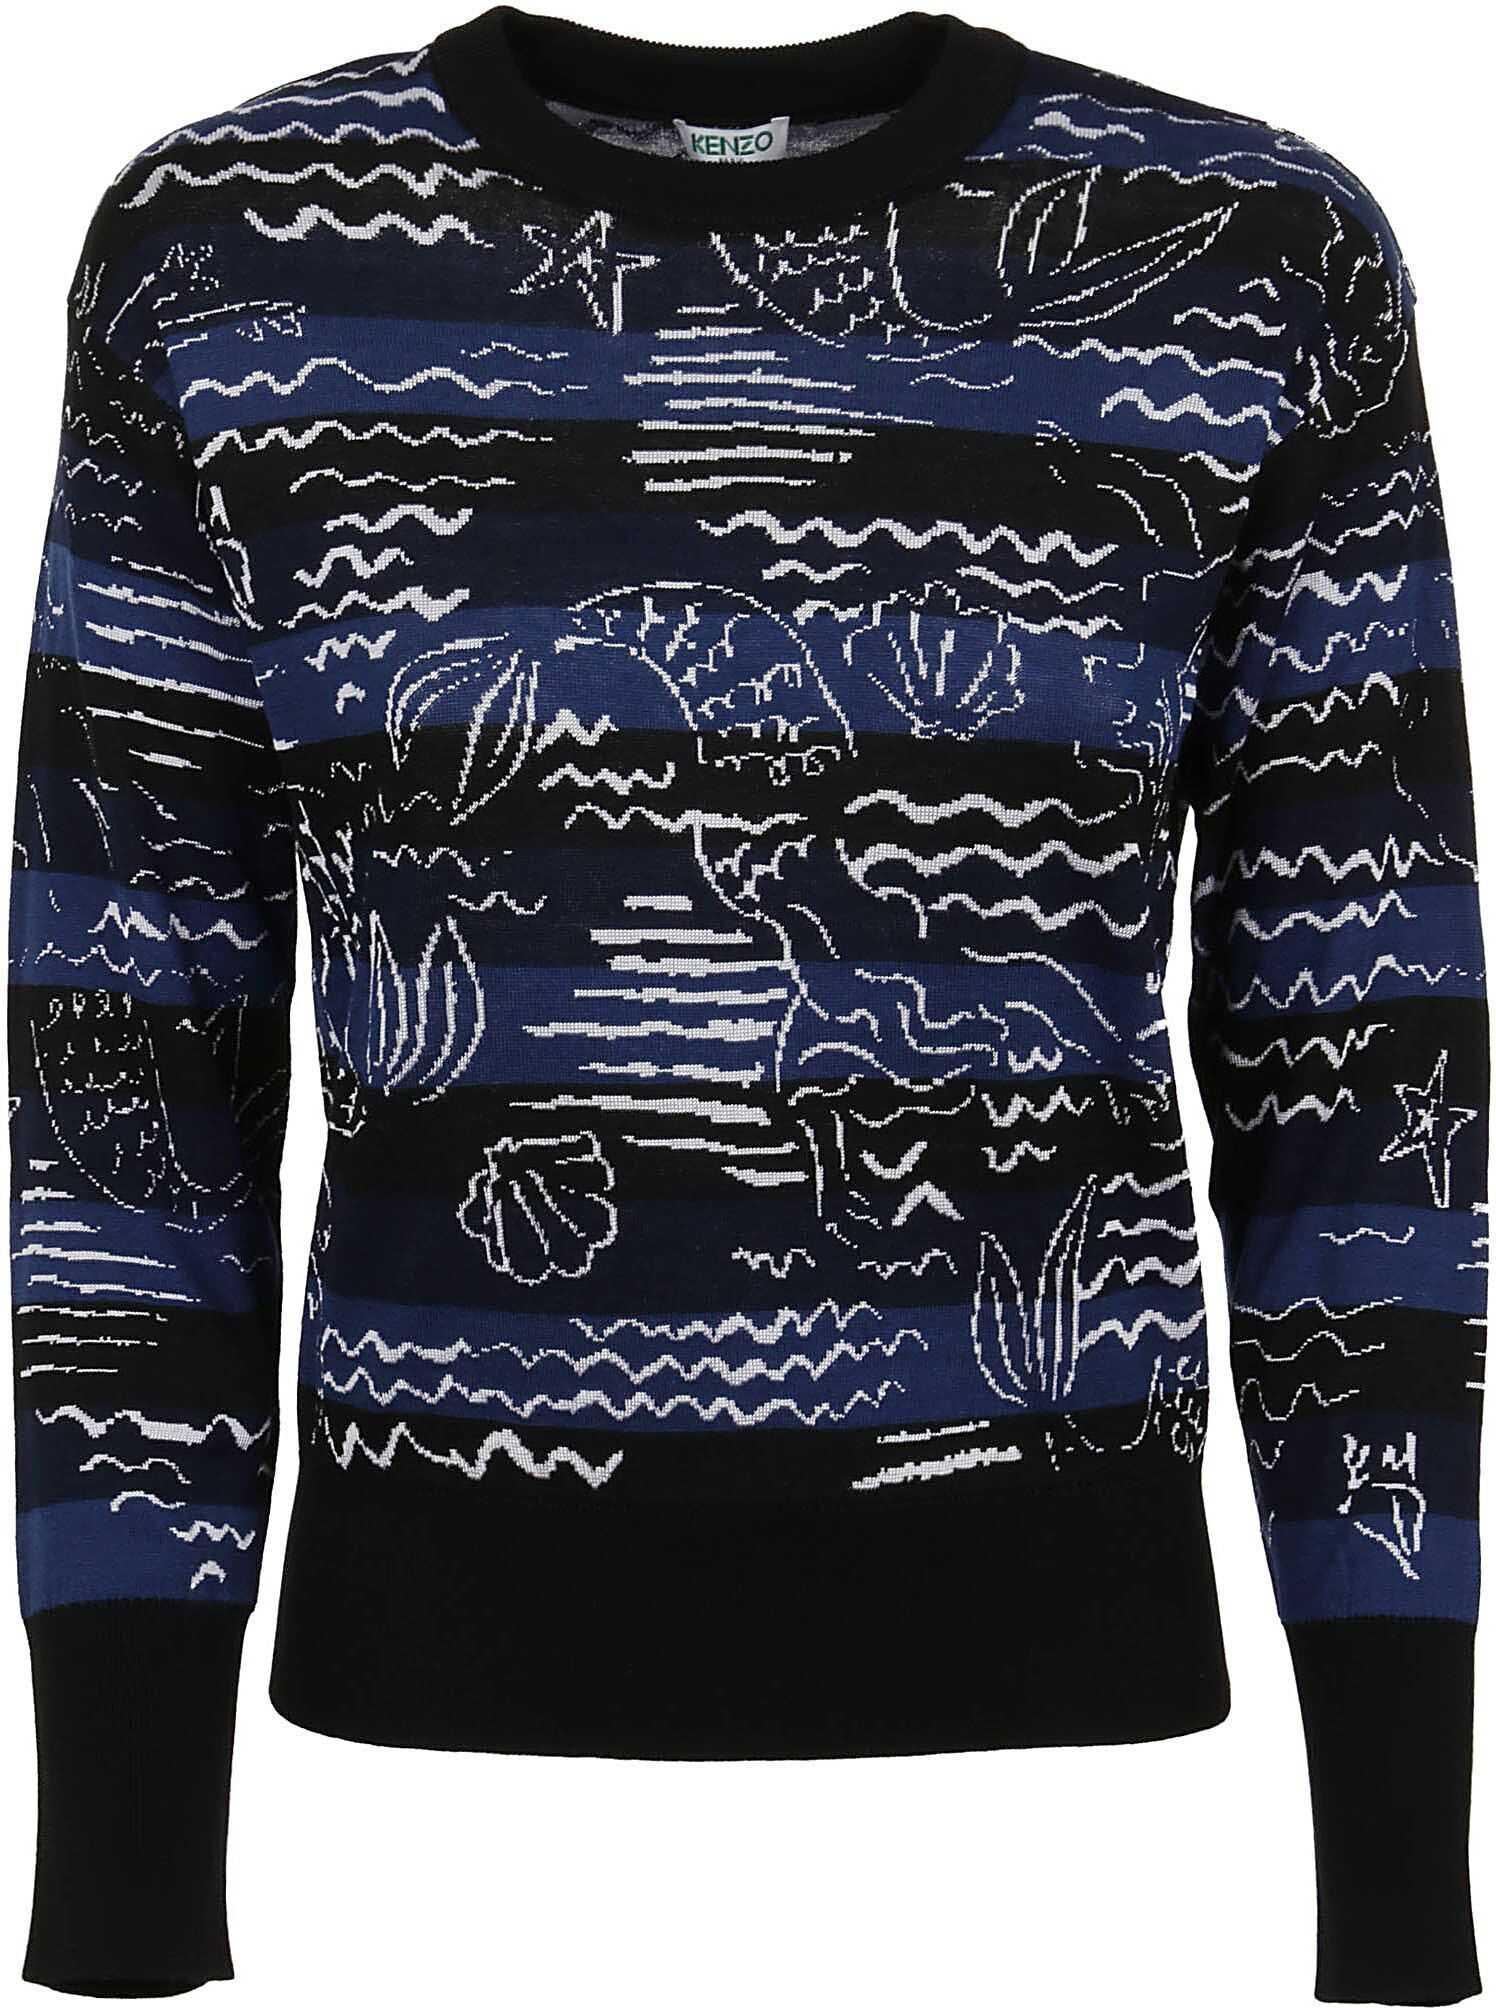 Kenzo Cotton Sweater BLUE